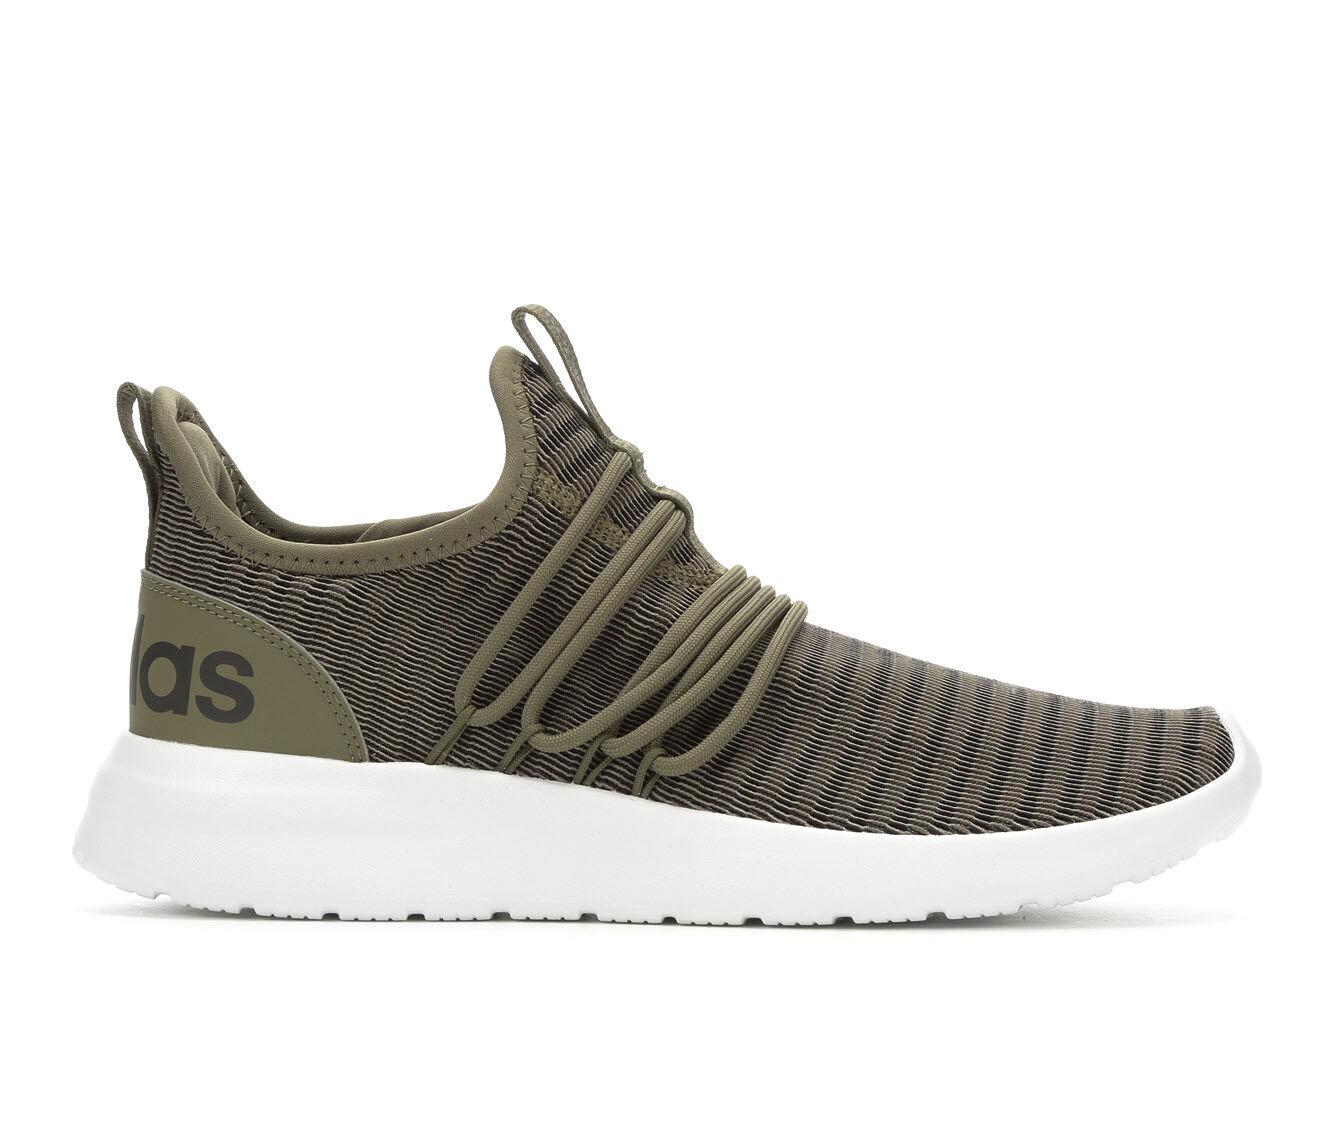 Men's Adidas Lite Racer Adapt Sneakers Olv/Wht/Blk